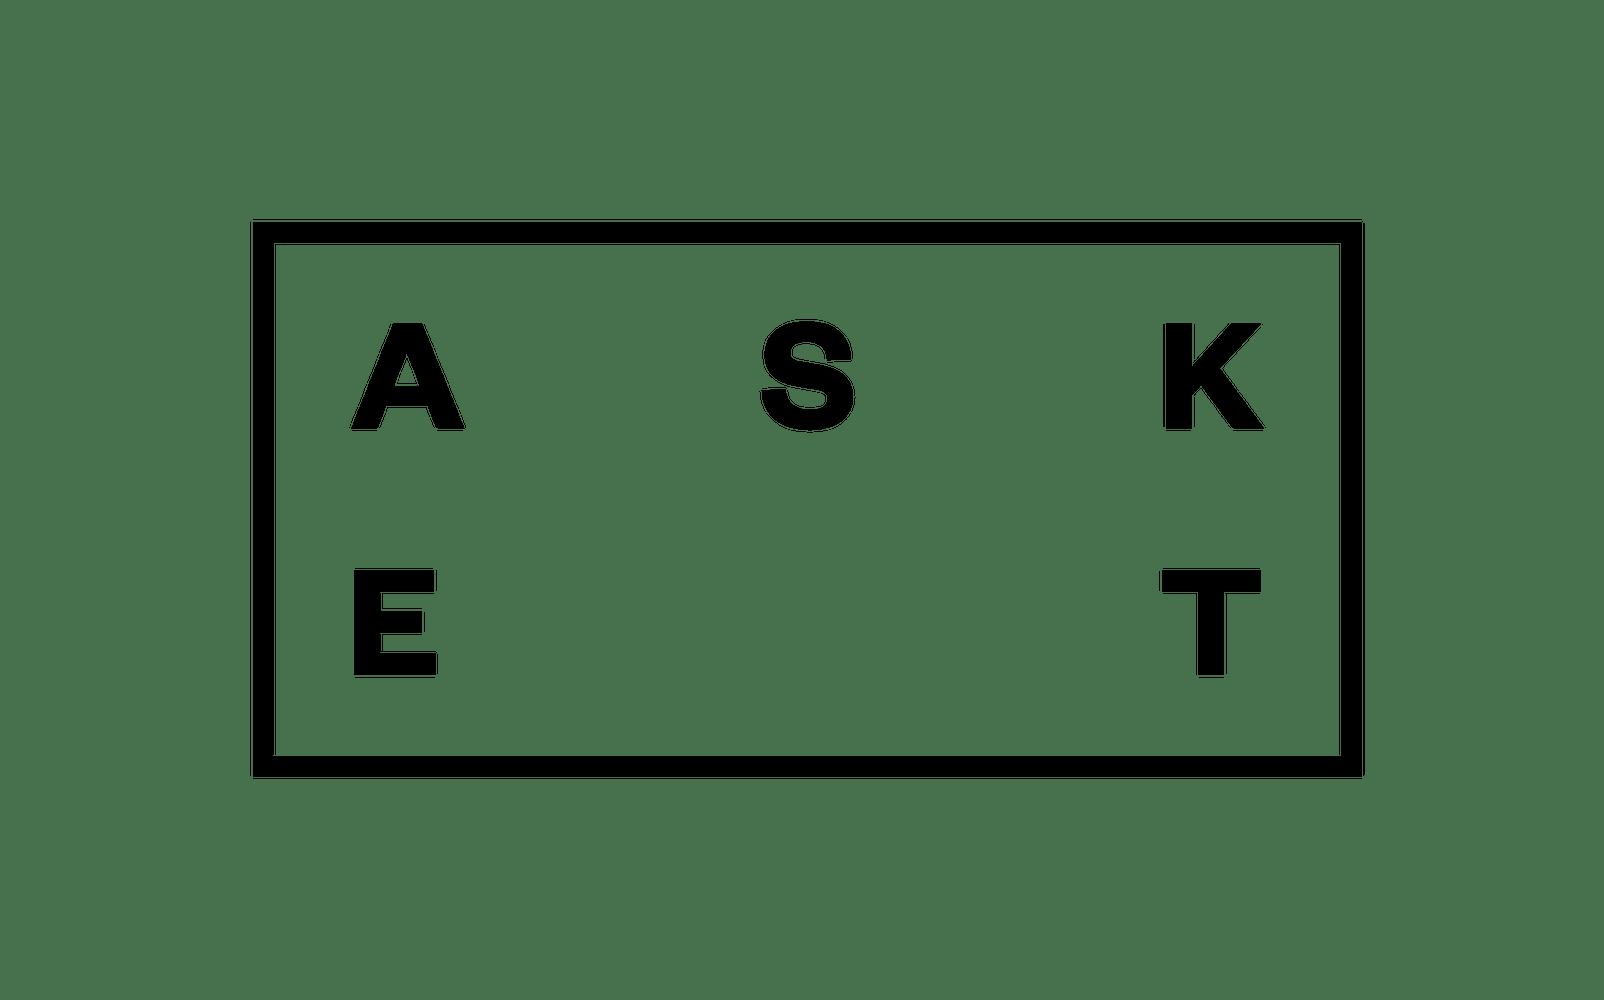 Asket company logo